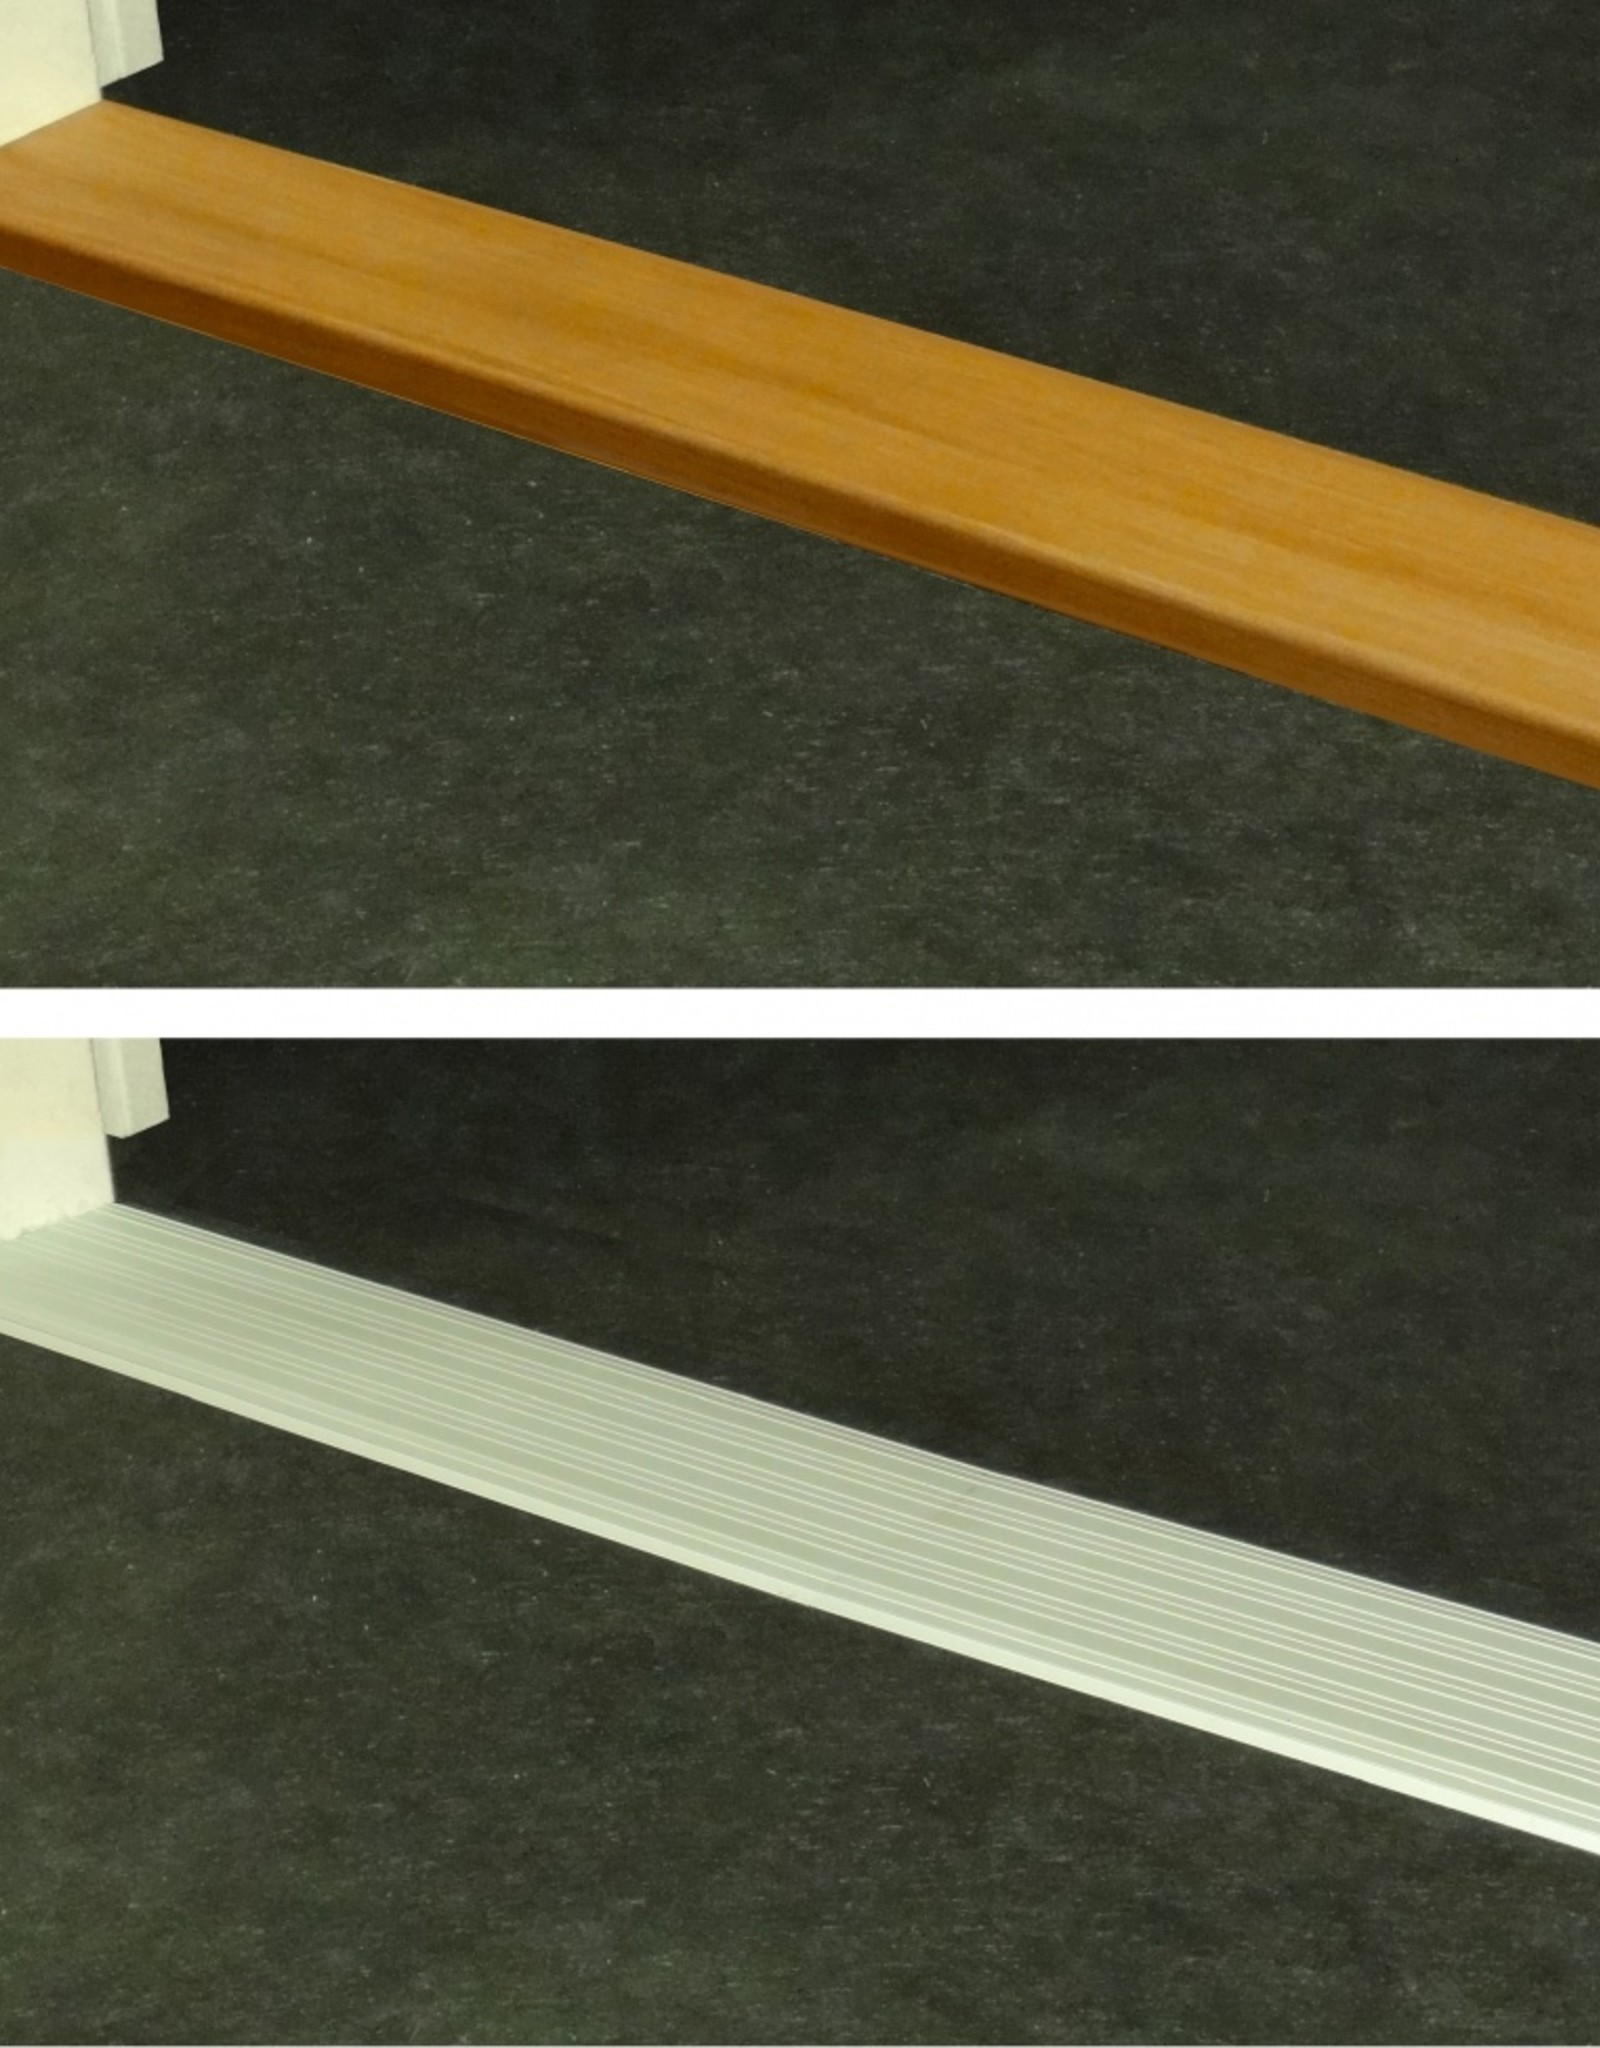 Able2 Indoor Drempelvervanger